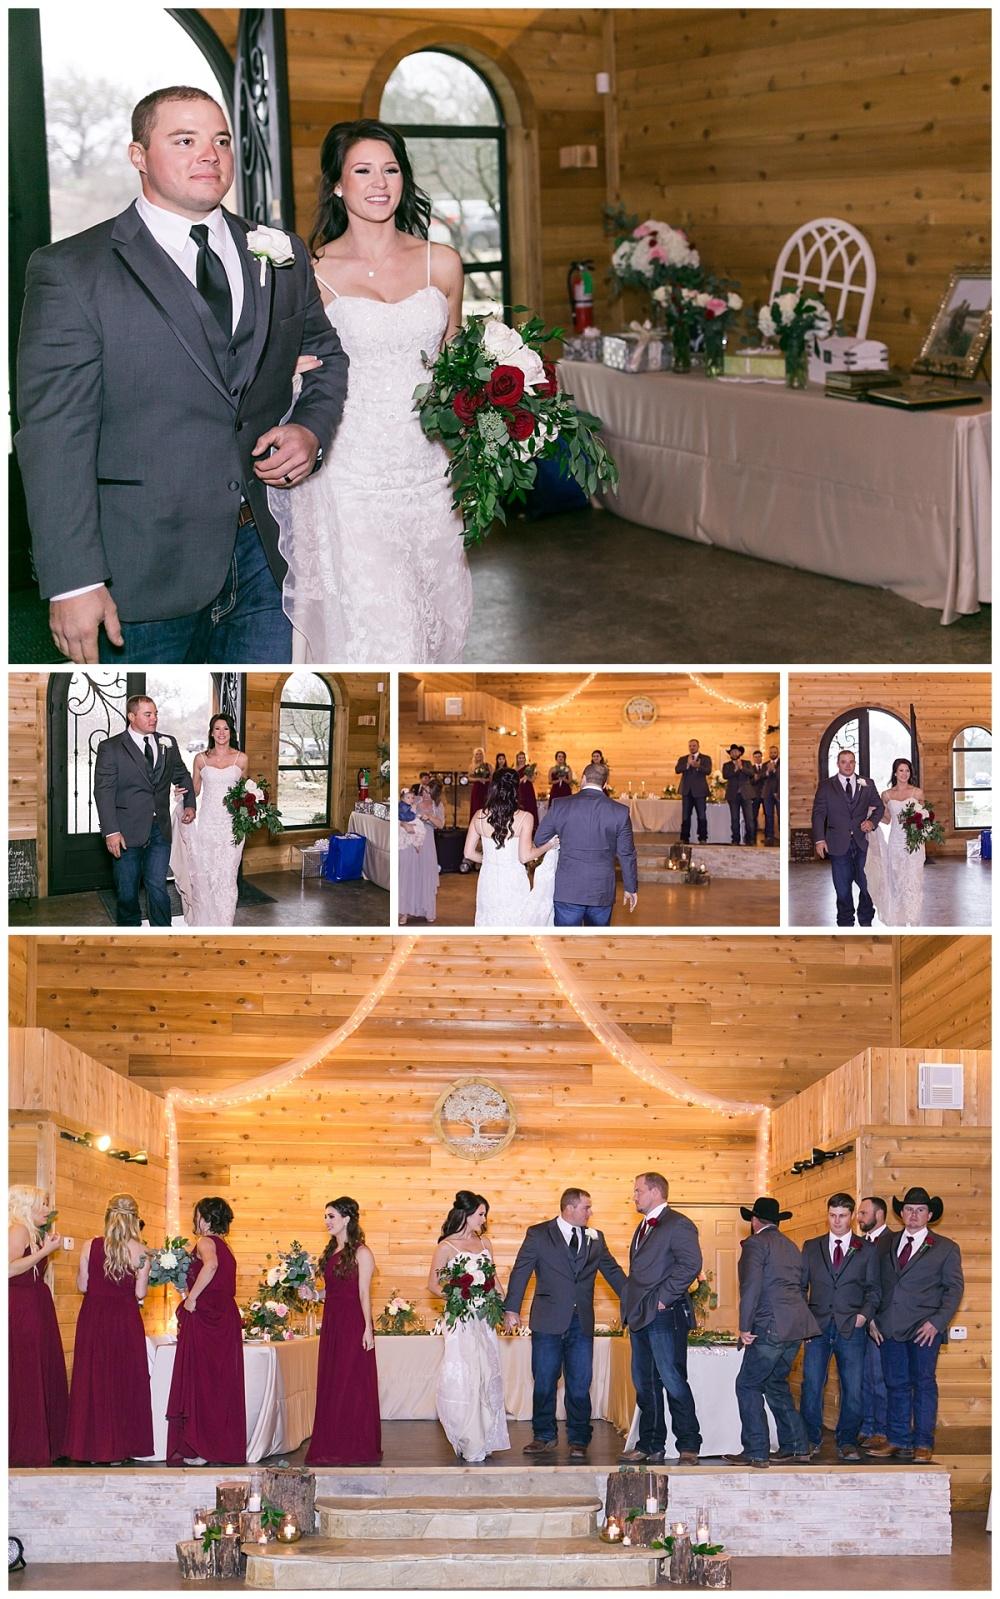 Carly-Barton-Photography-Geronimo-Oaks-Wedding-Venue-Texas-Hill-Country-Ronnie-Sarah_0112.jpg